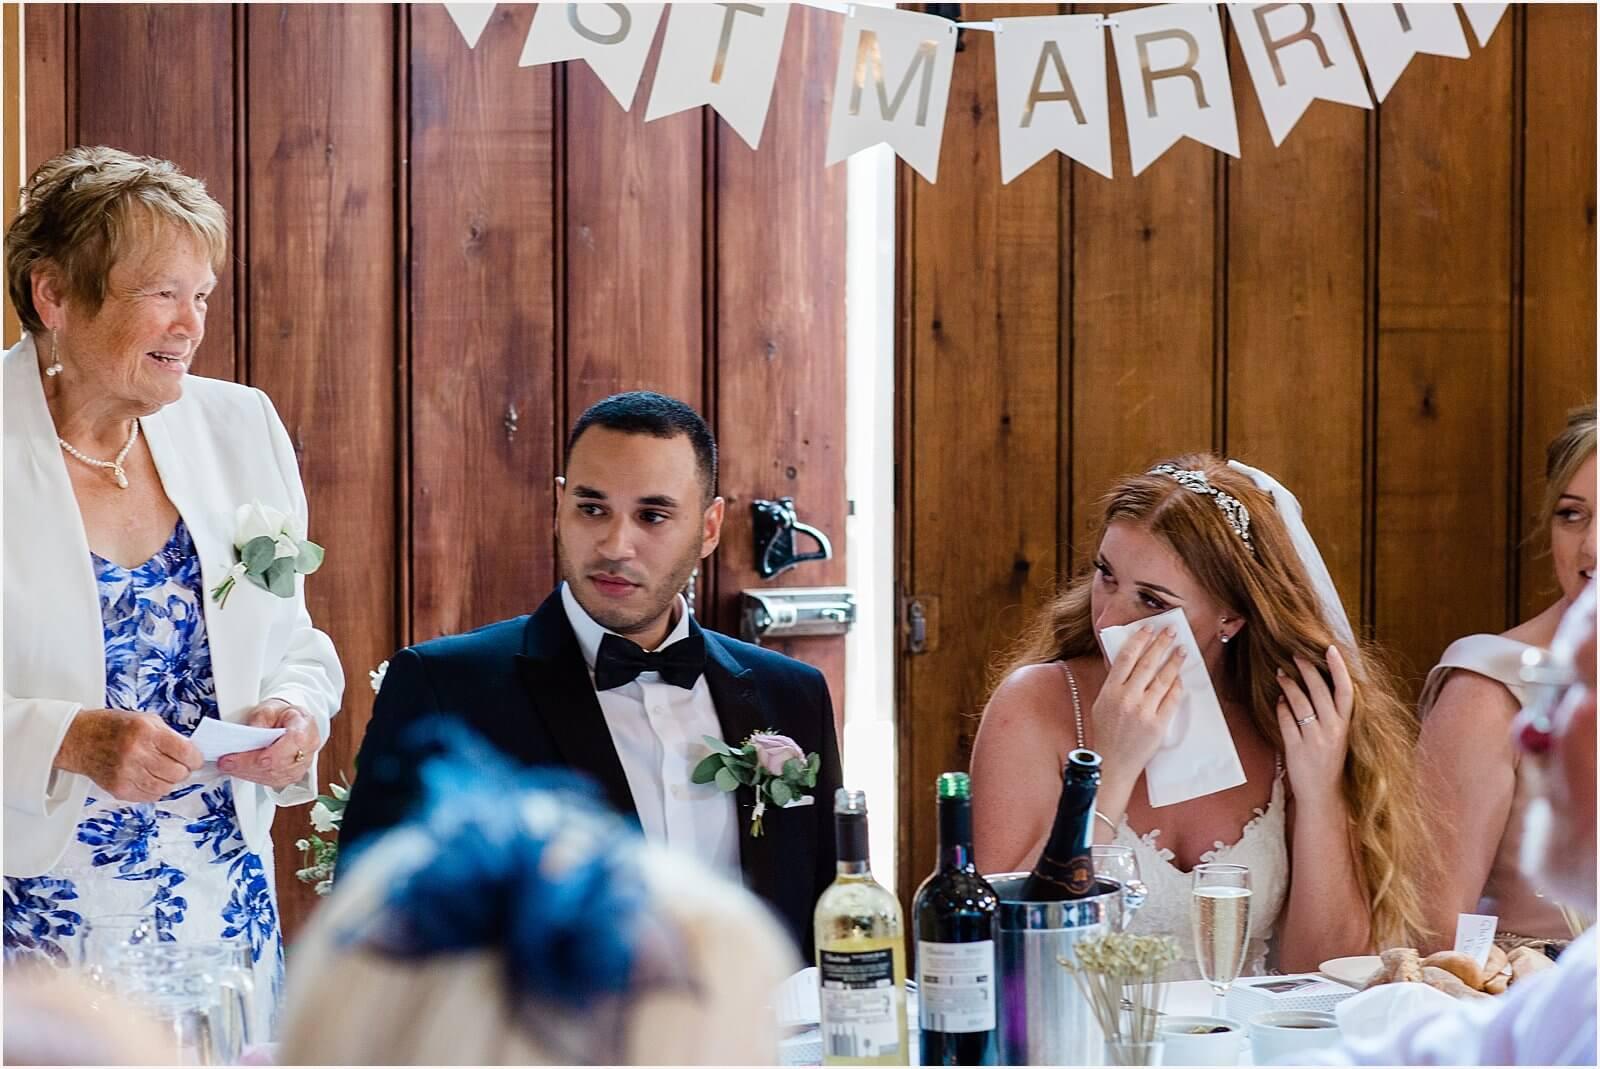 Swallows Oast Wedding - Jakki + Luke's barn wedding photography 48